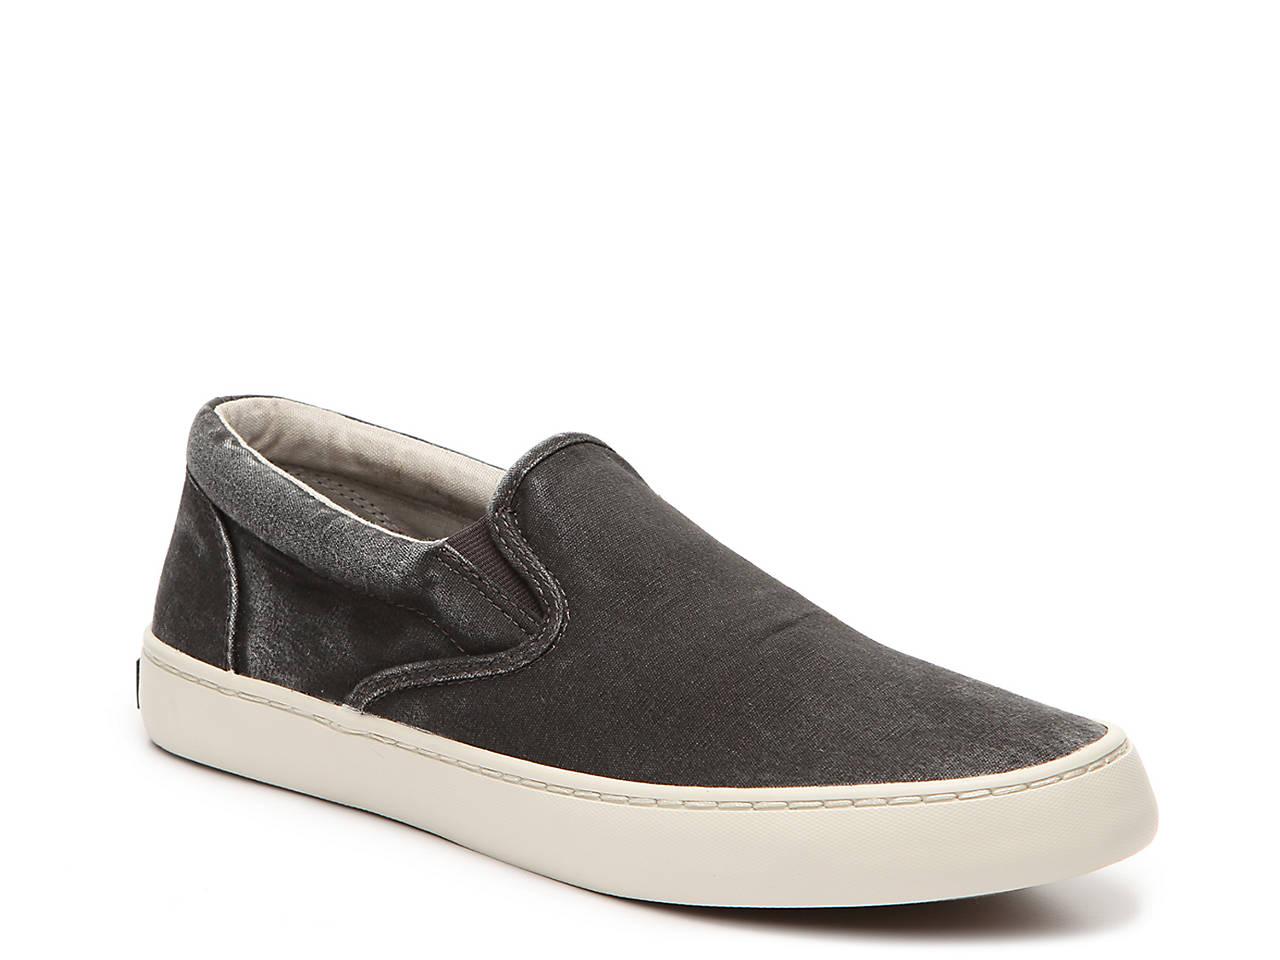 Sperry Top-Sider Cutter Slip-On Sneaker Men s Shoes  38717972f